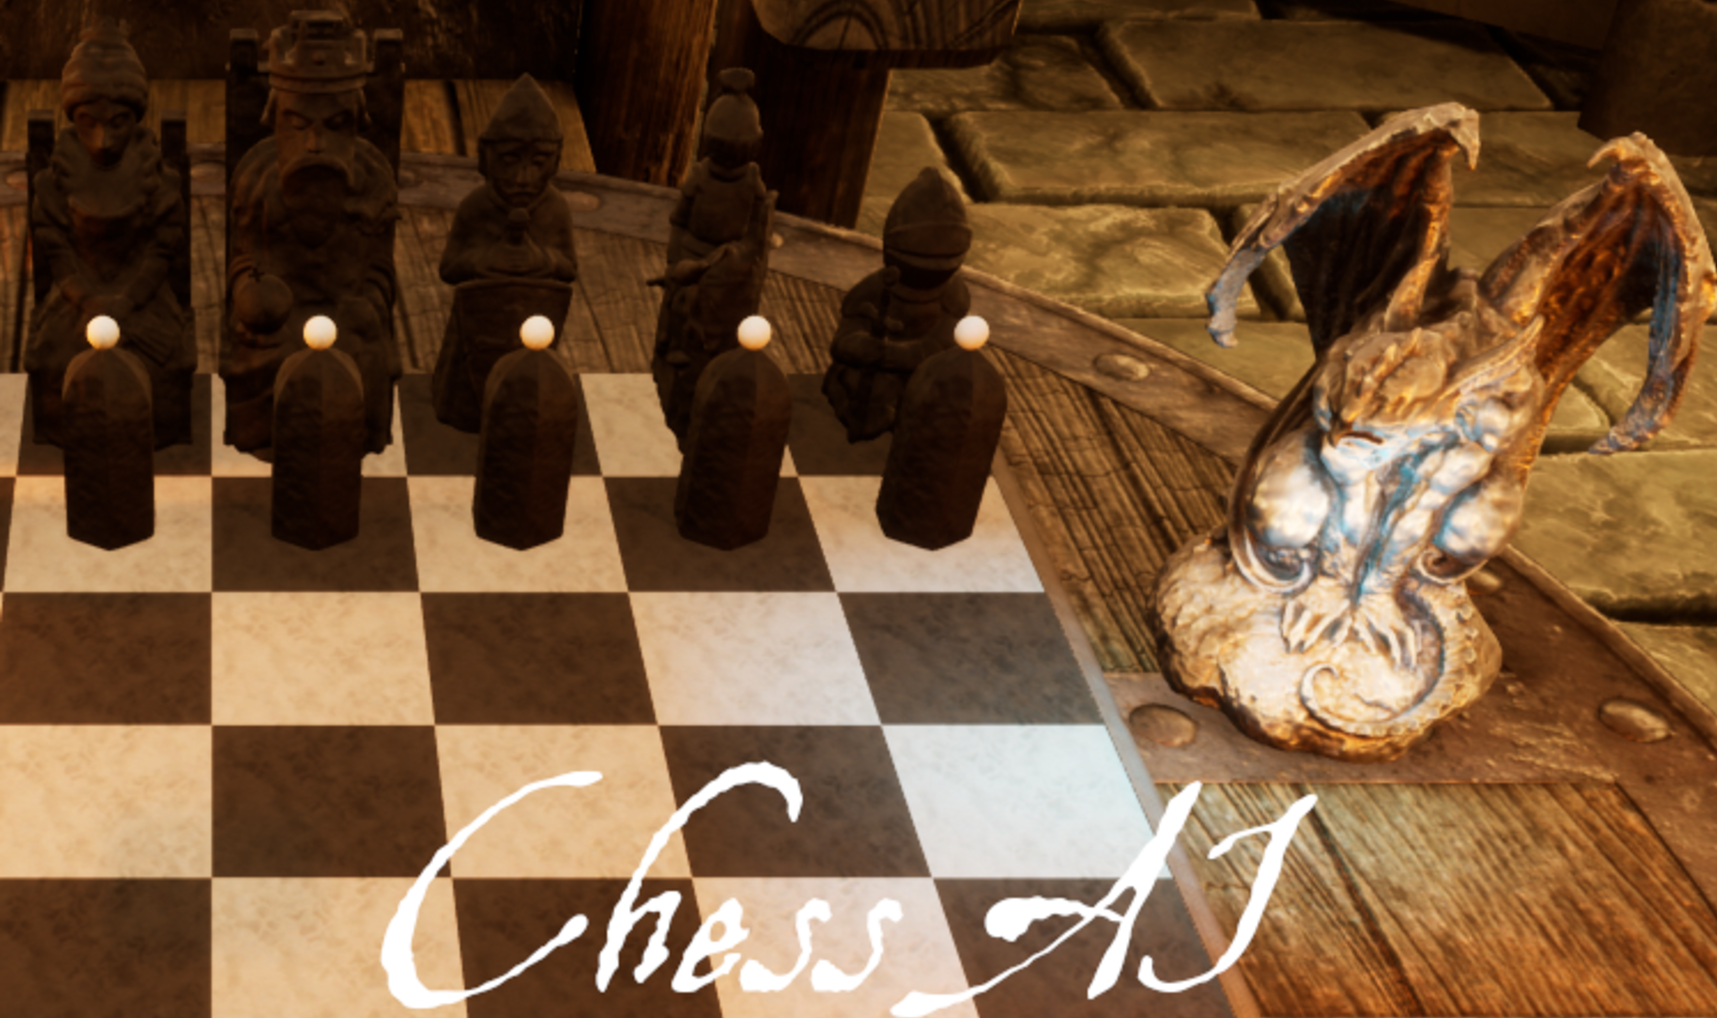 Chess AI: Min Max - University project done EPIC